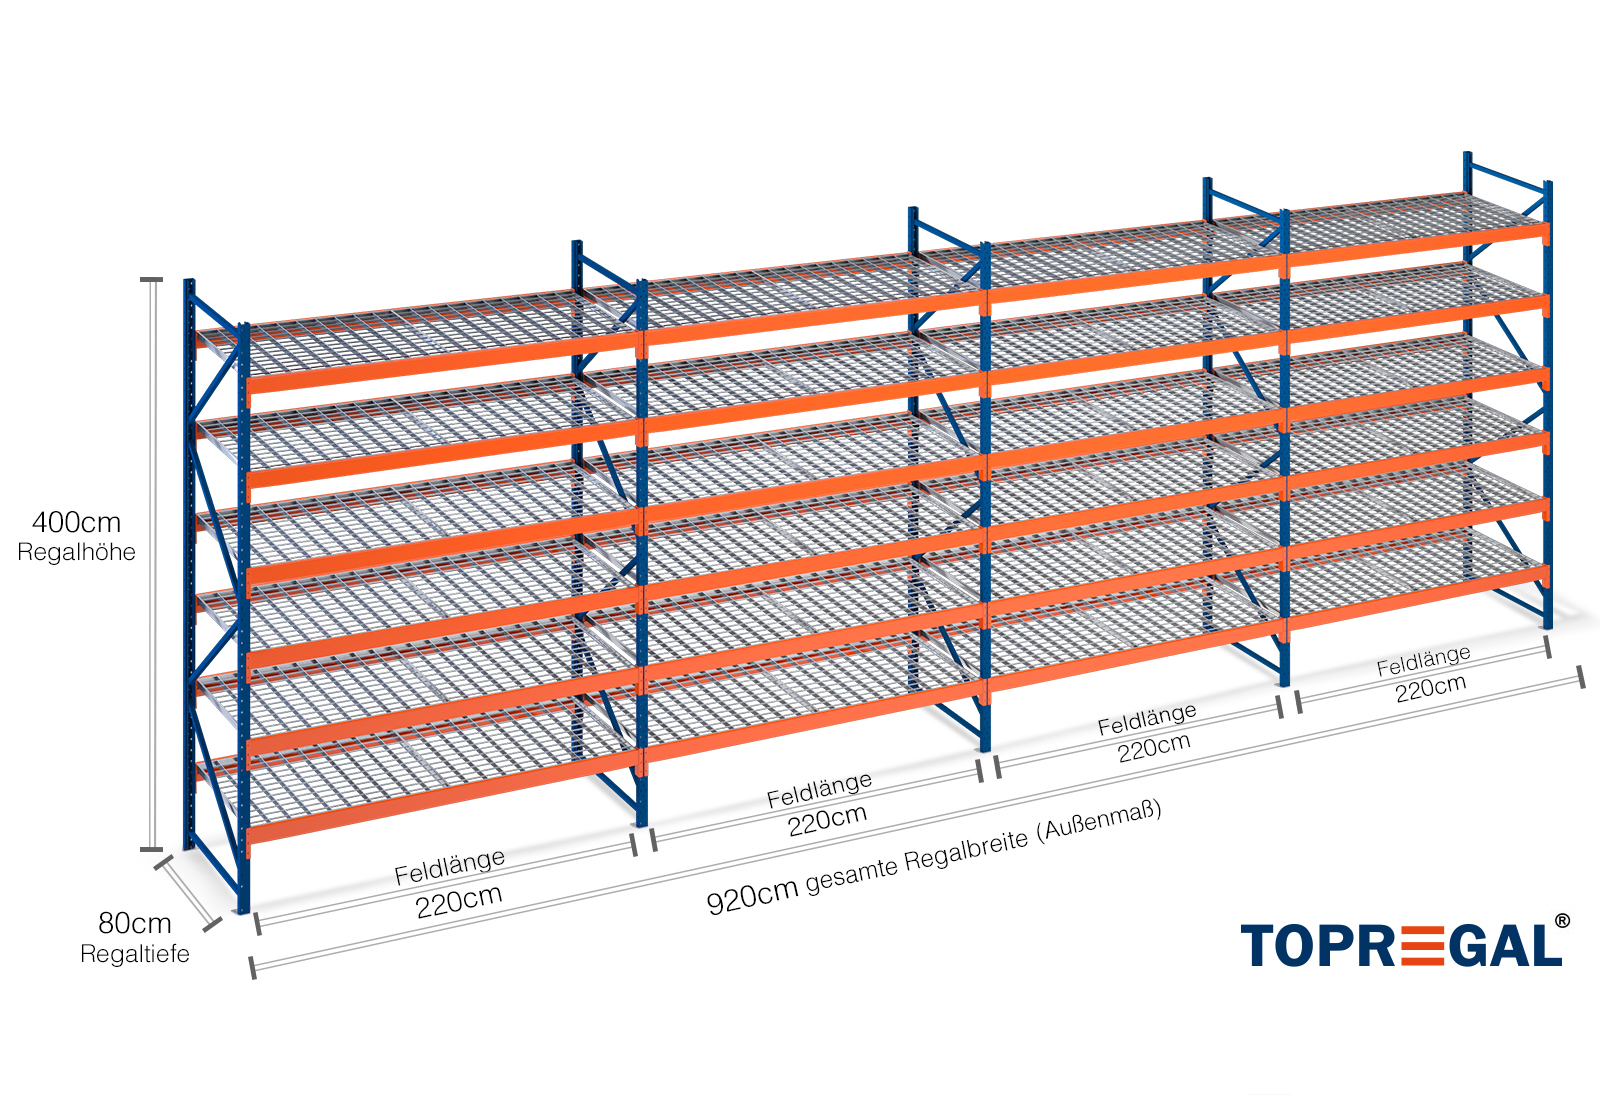 9 2m lagerregal 400cm hoch 80cm tief mit 6 ebenen inkl gitterrost. Black Bedroom Furniture Sets. Home Design Ideas